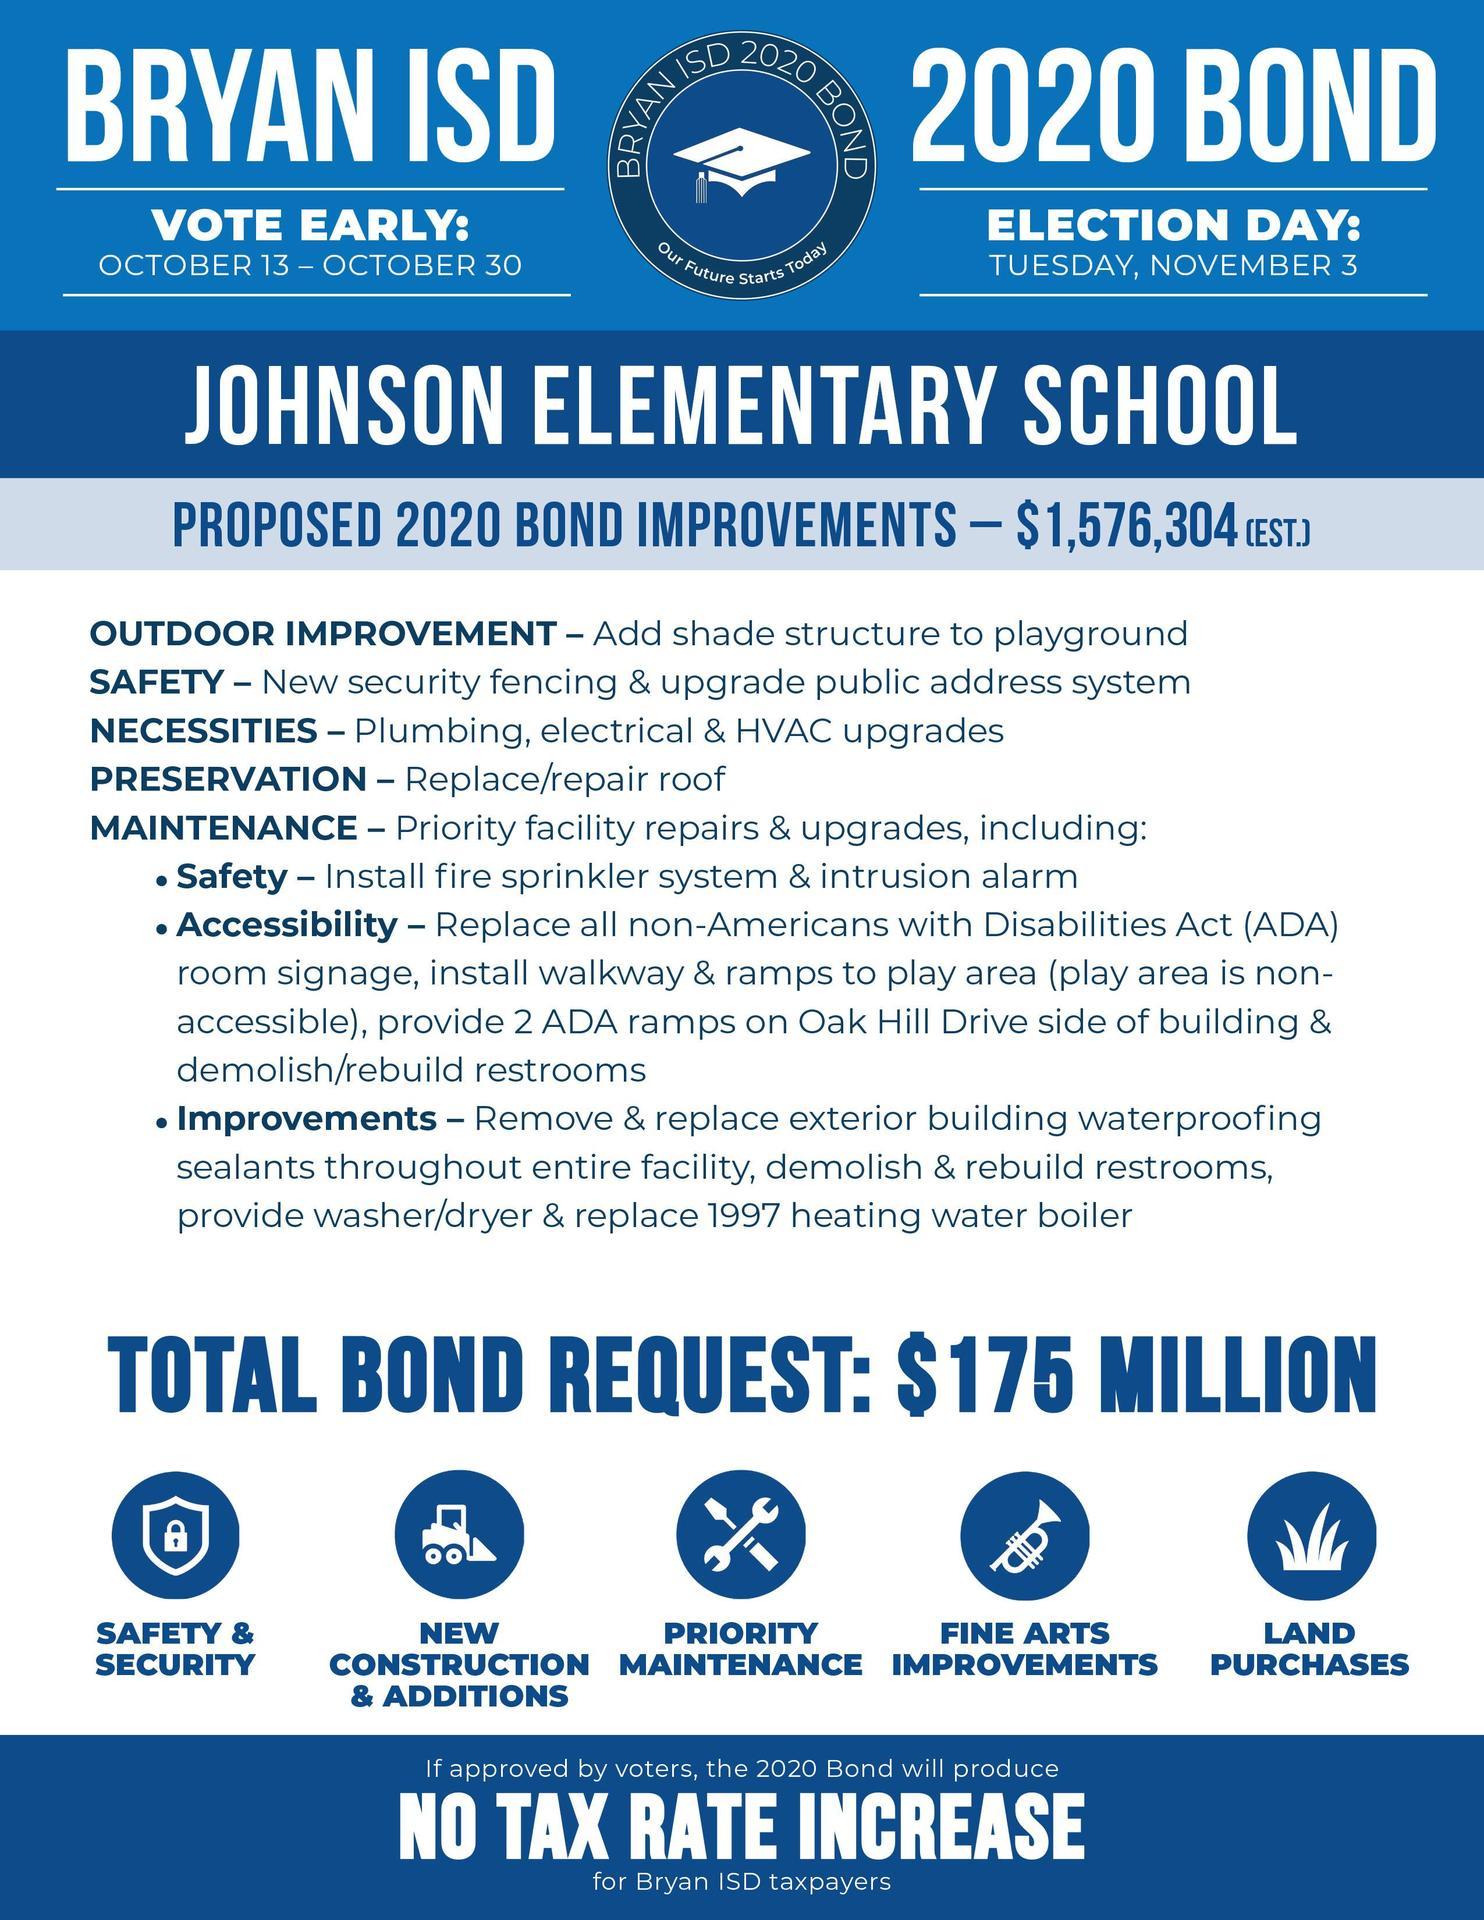 Johnson Elementary School Bond Information